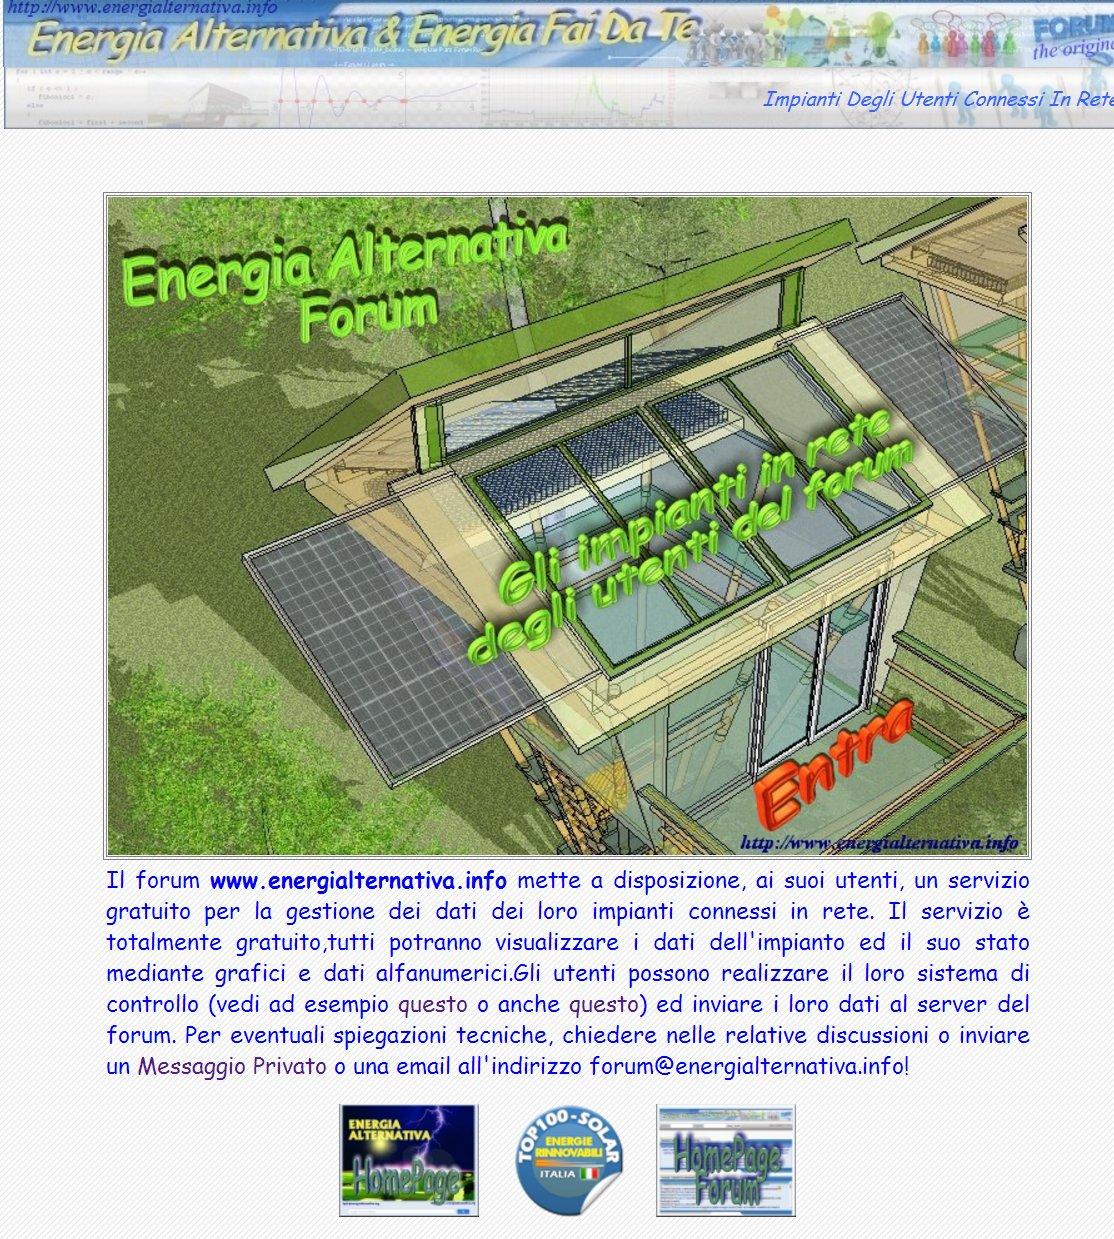 http://www.energialternativa.info/public/newforum/ForumEA/L/ImpiantiConnessiInRete.jpg